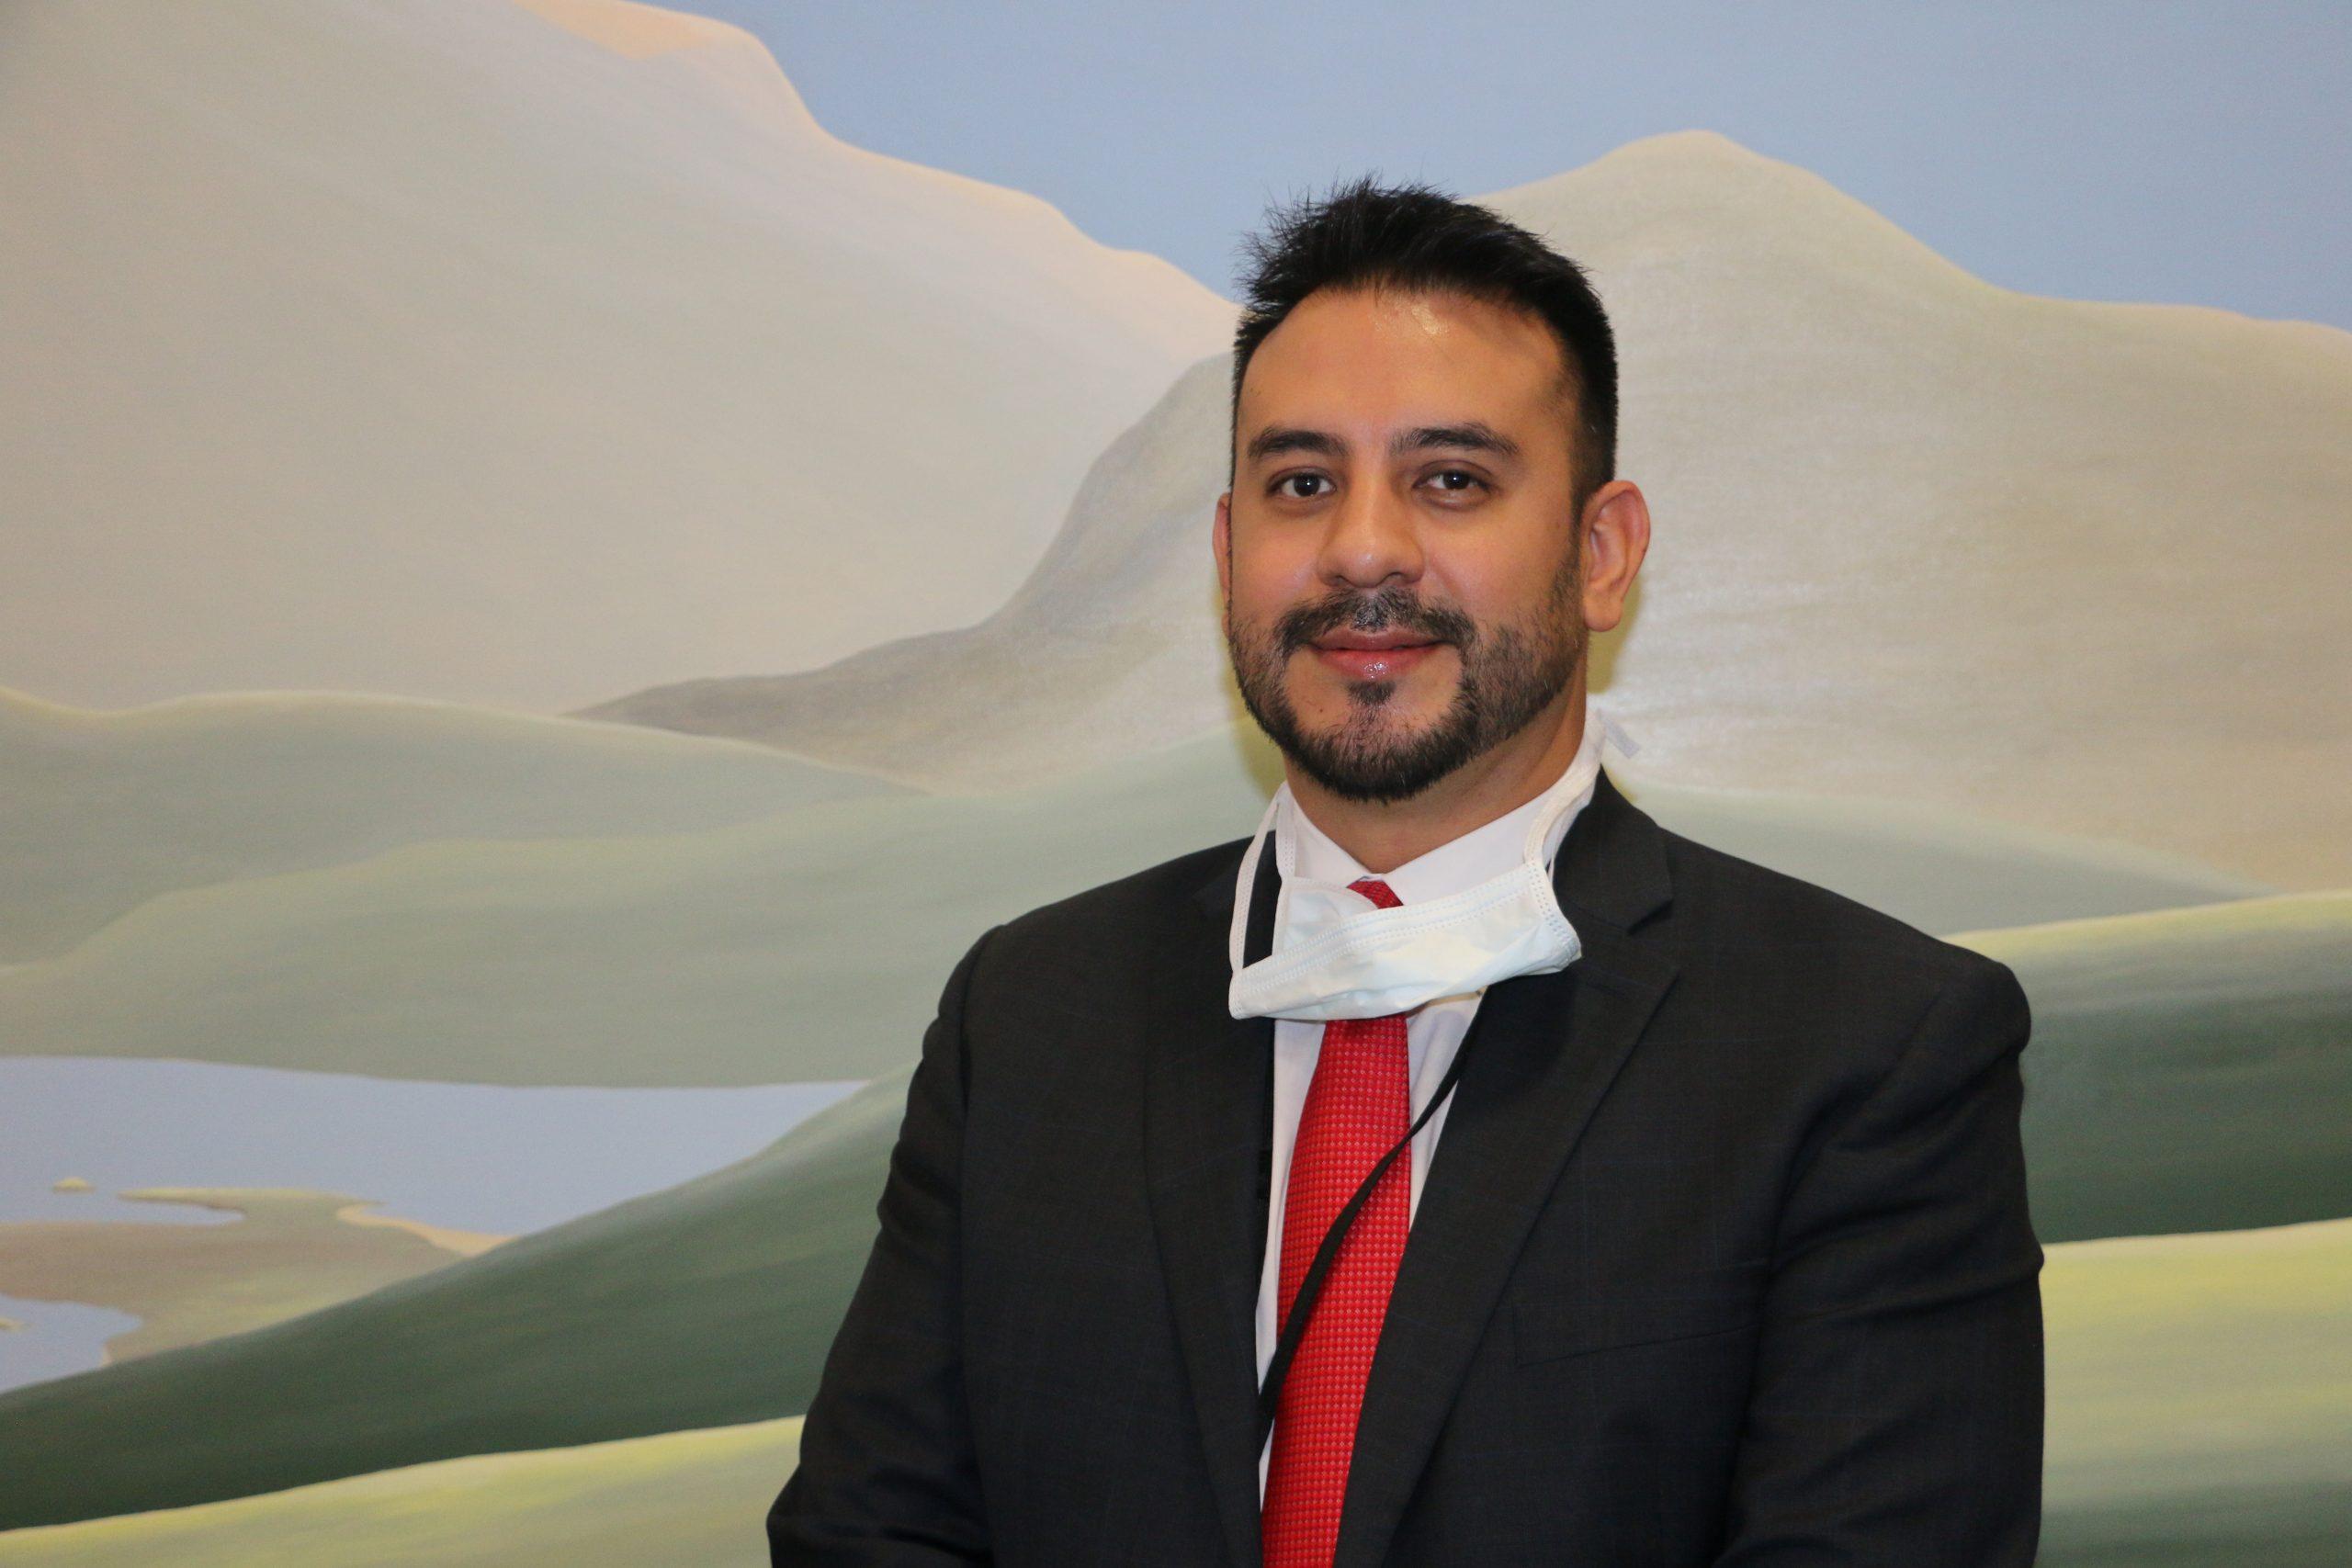 Success Story: Jose Gurrola